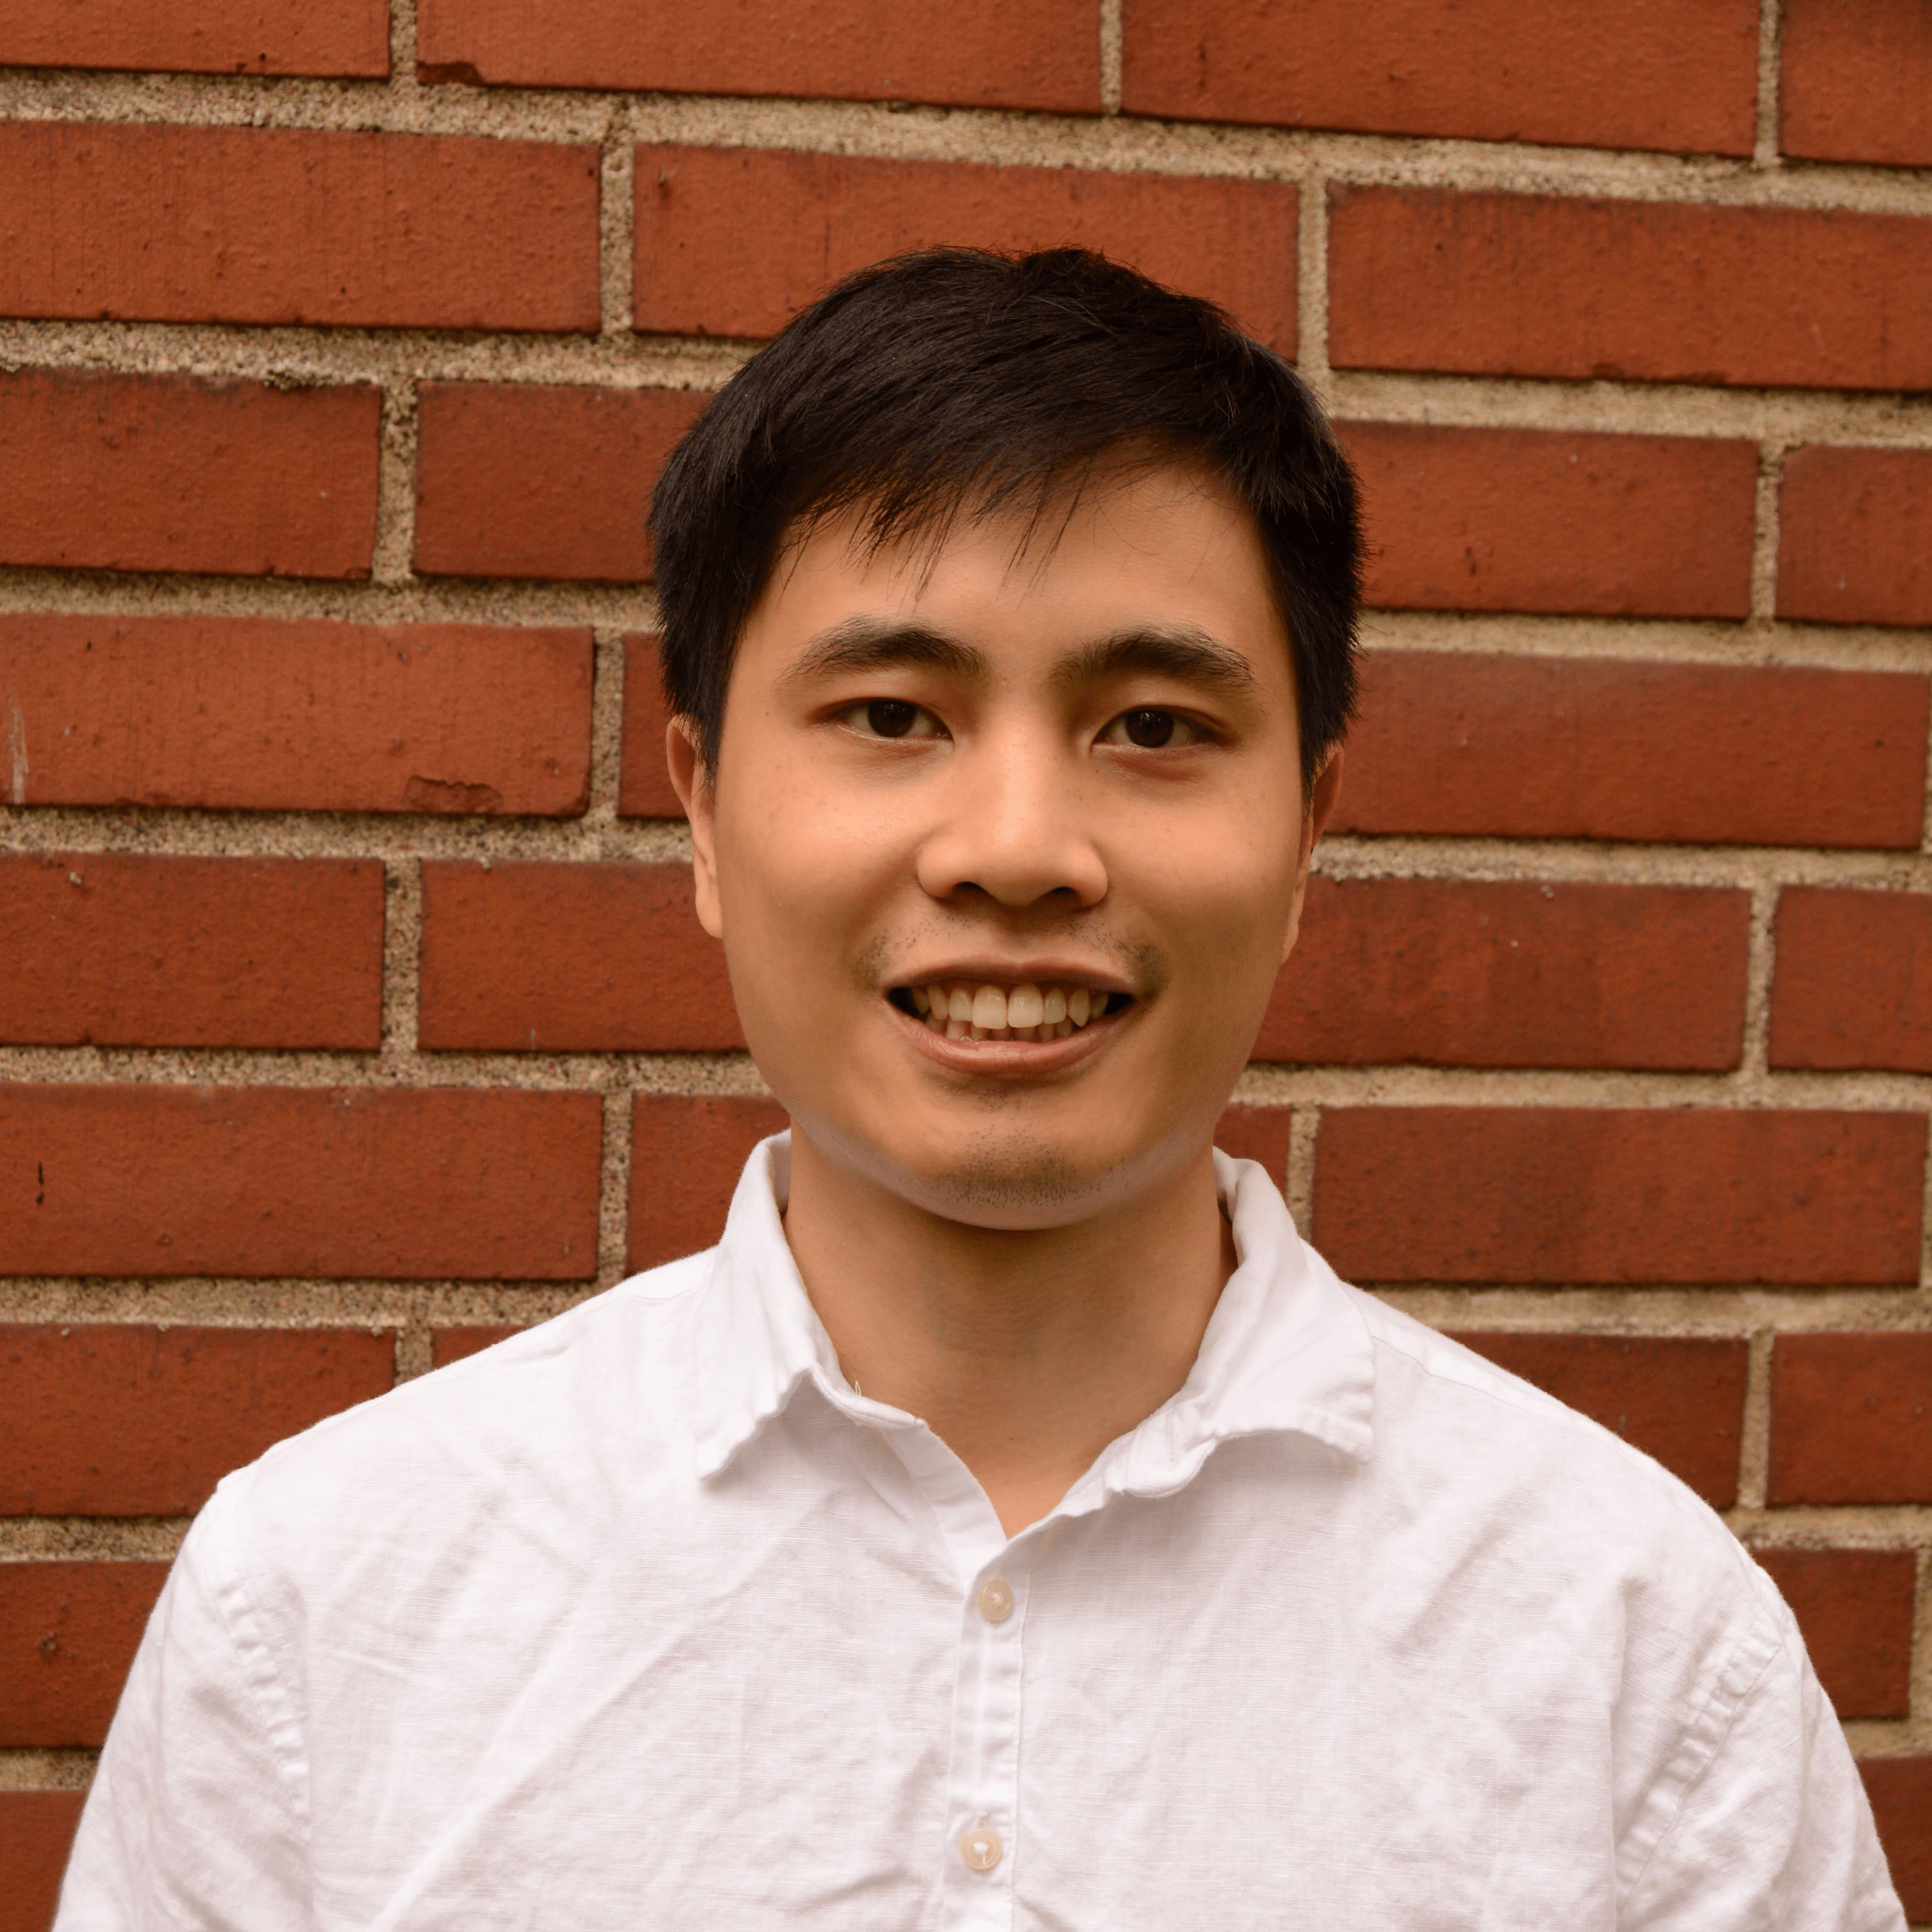 Hoang M. Nguyen